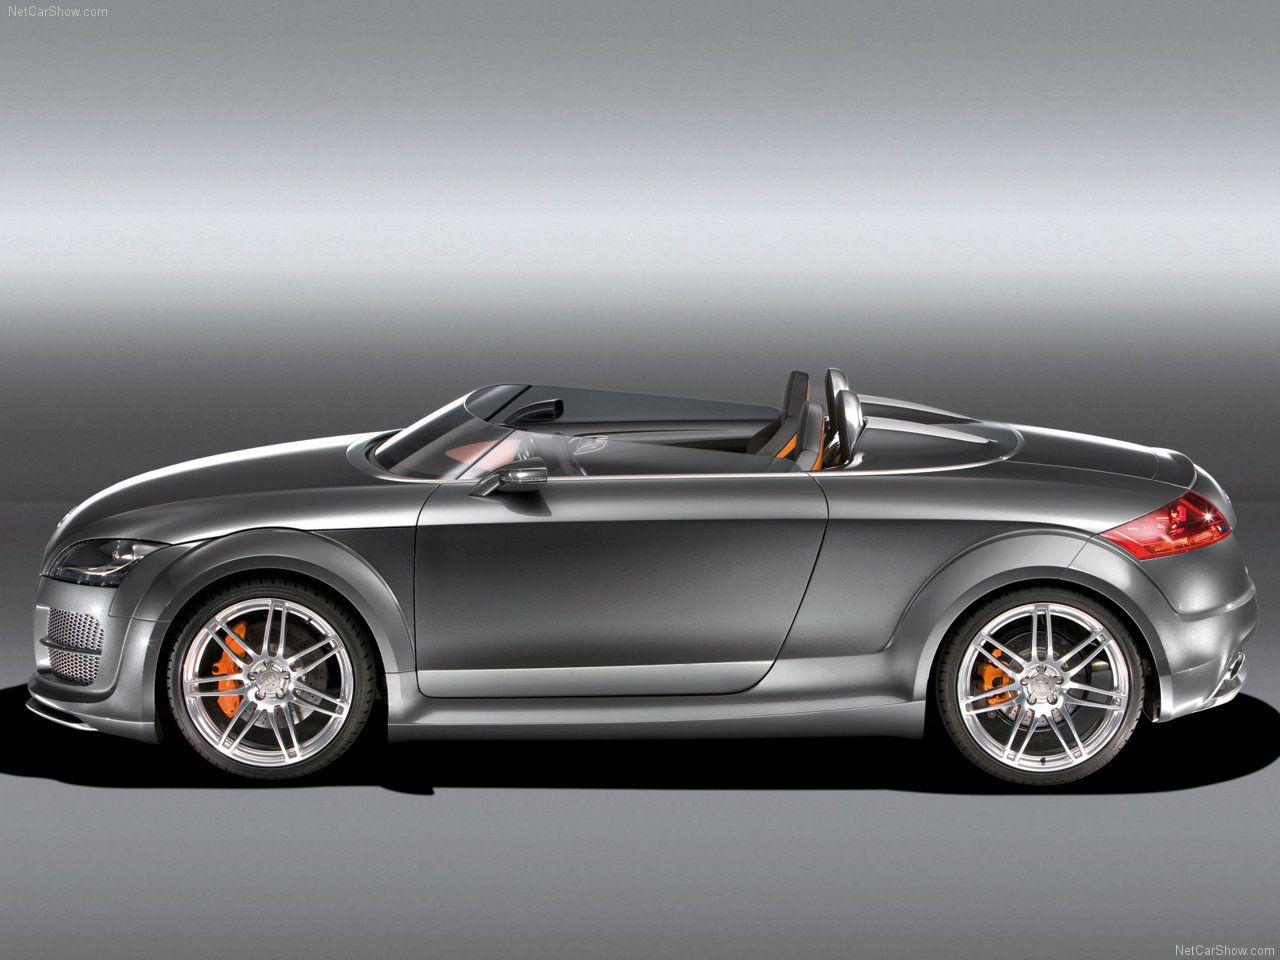 2009 audi tt quattro sport concept screensavers car picture collection